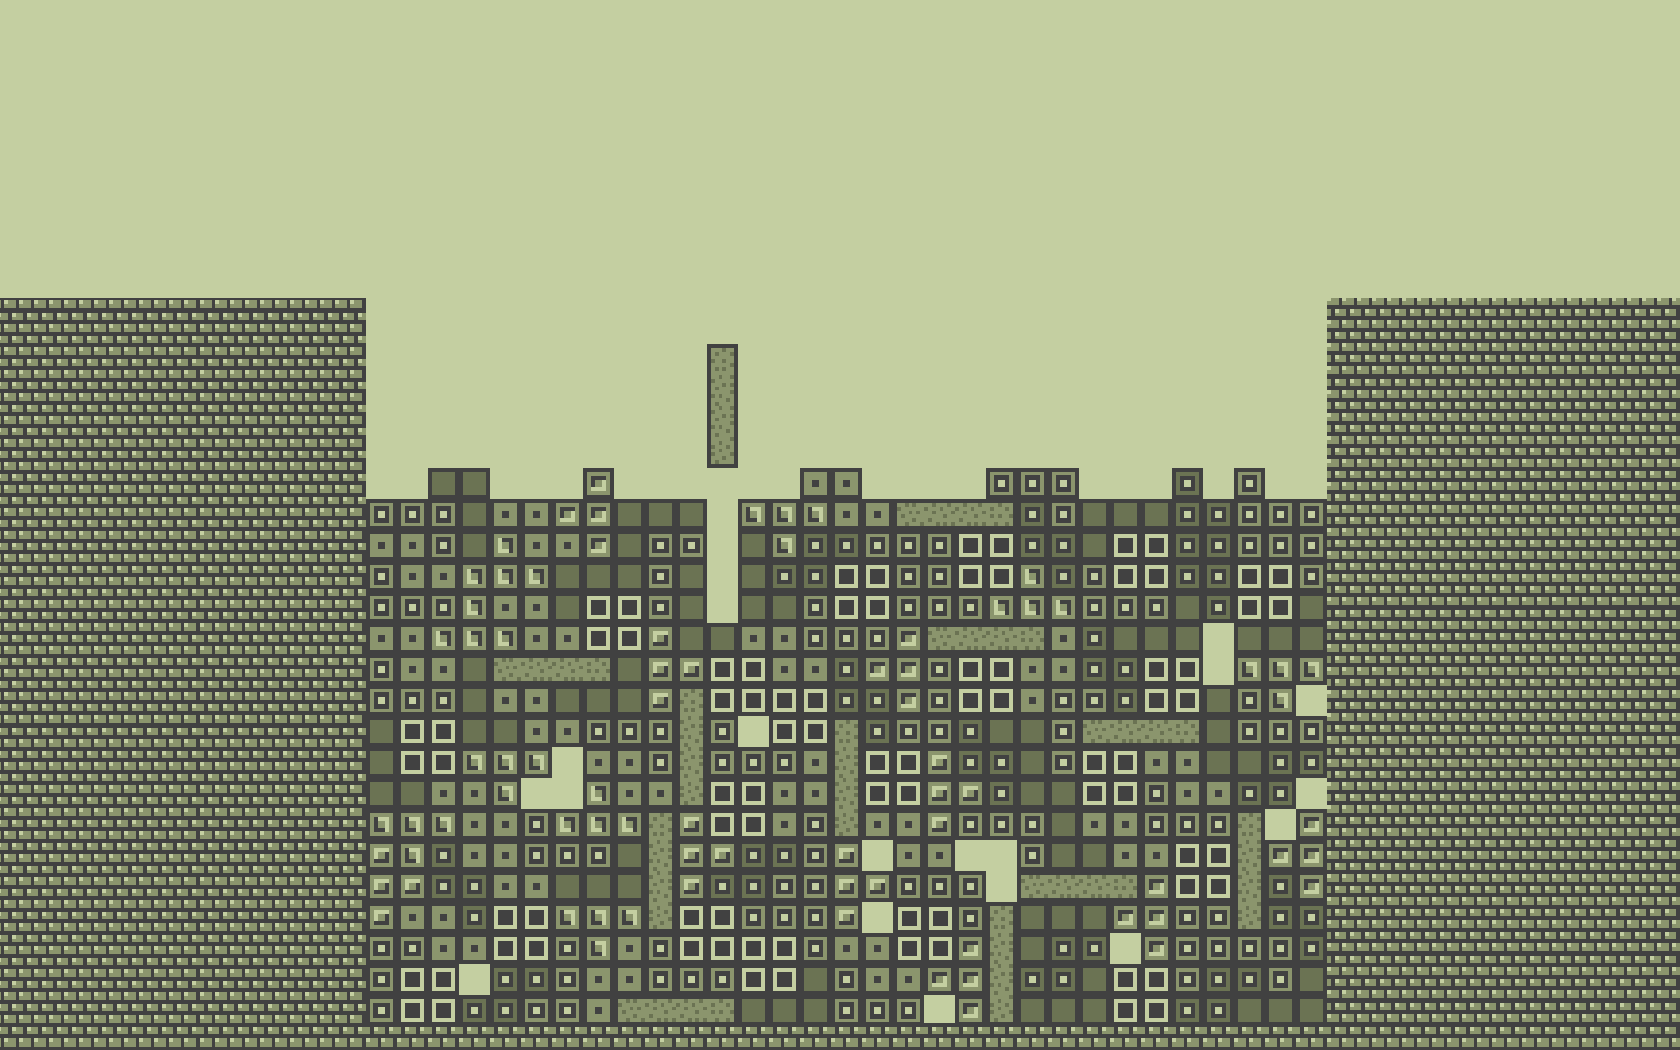 Tetris Wallpaper And Hintergrund 1680x1050 Id333868 Wallpaper